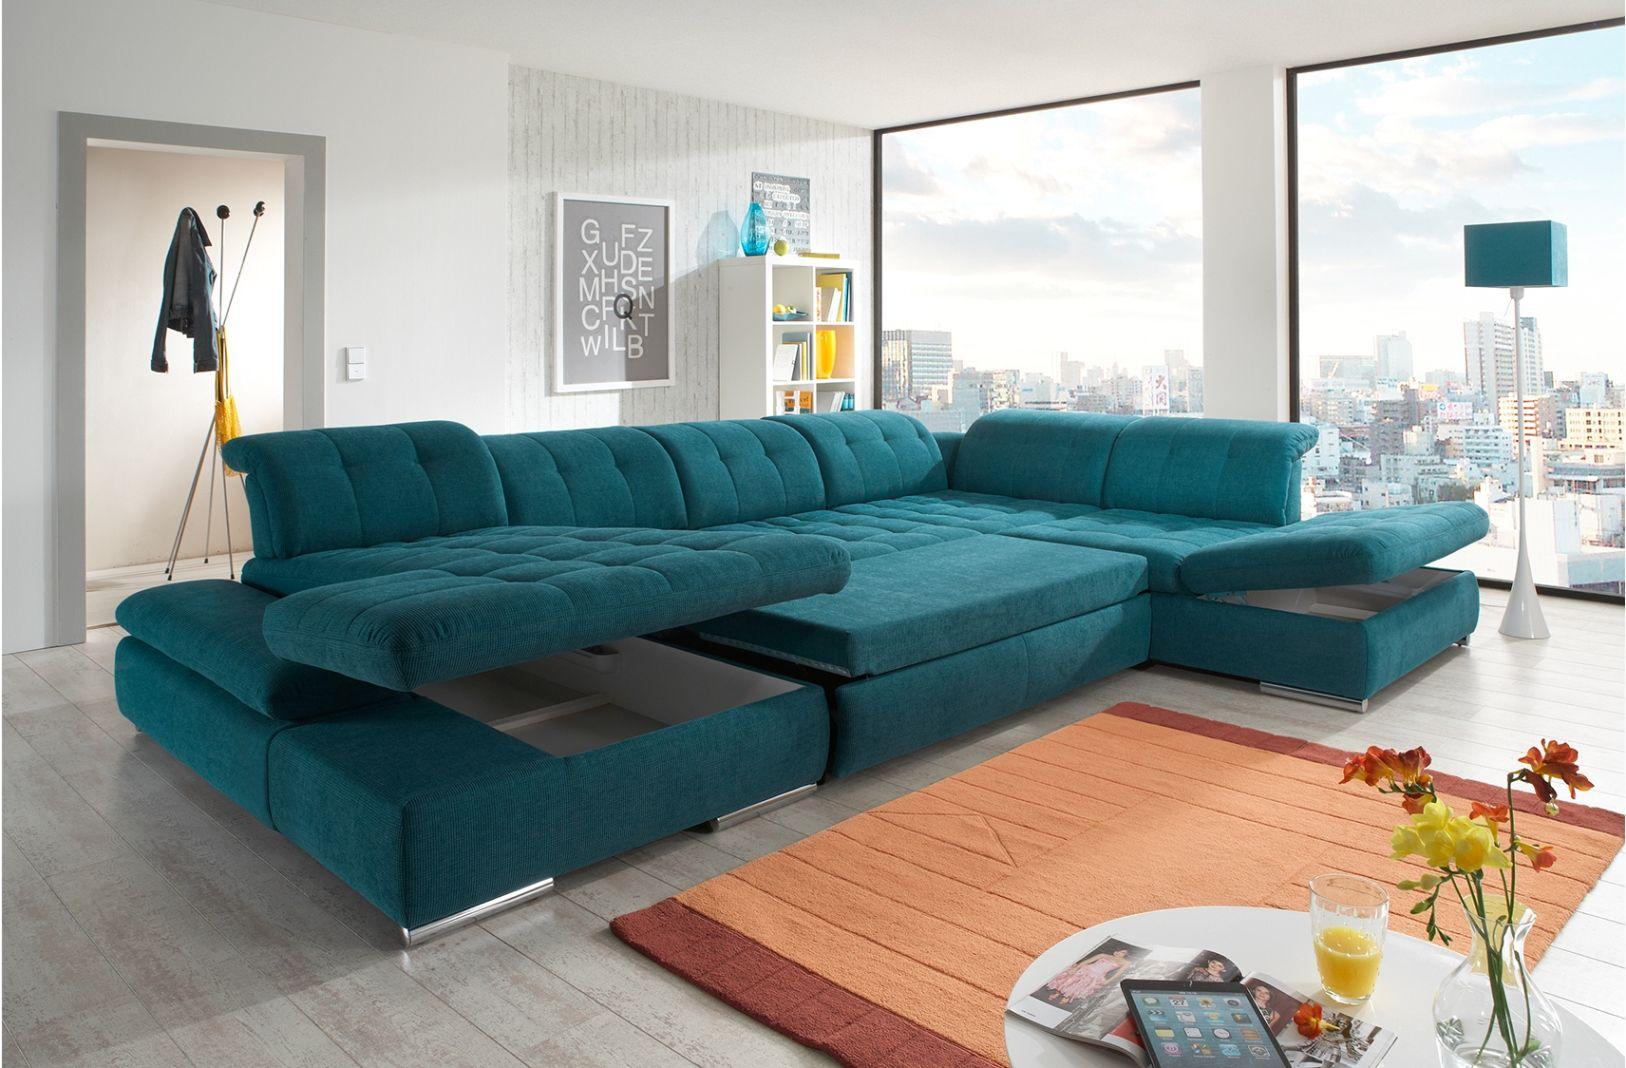 Alpine Sectional Sofa Sleeper With Storage Decoracao De Casa Casas Sala Sofa